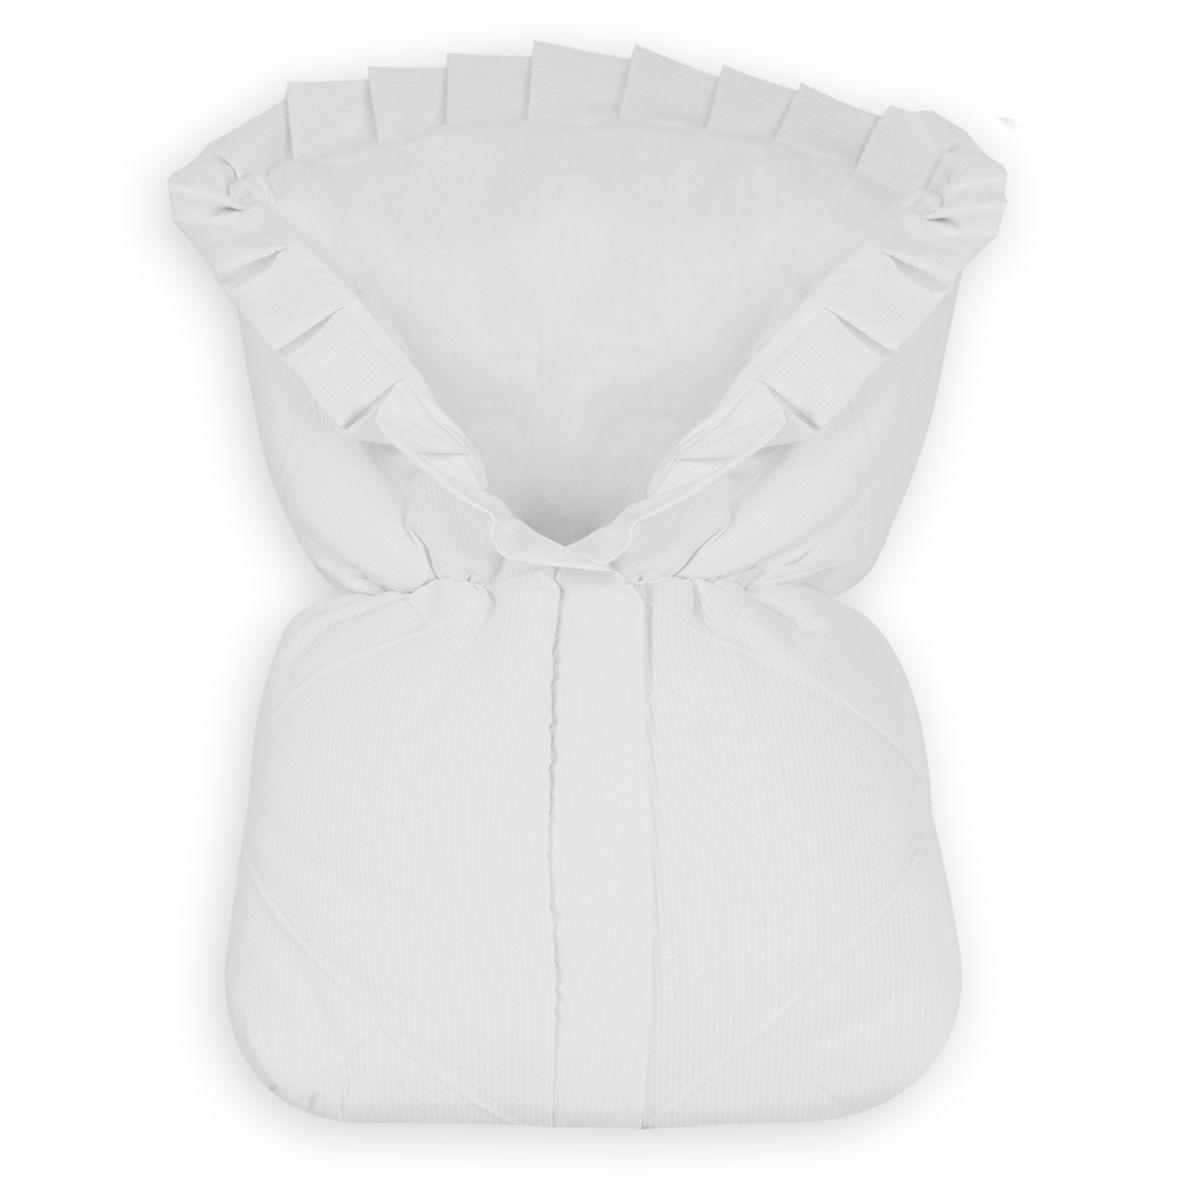 Saco de Bebê 100% Alg. - Piquet Branco